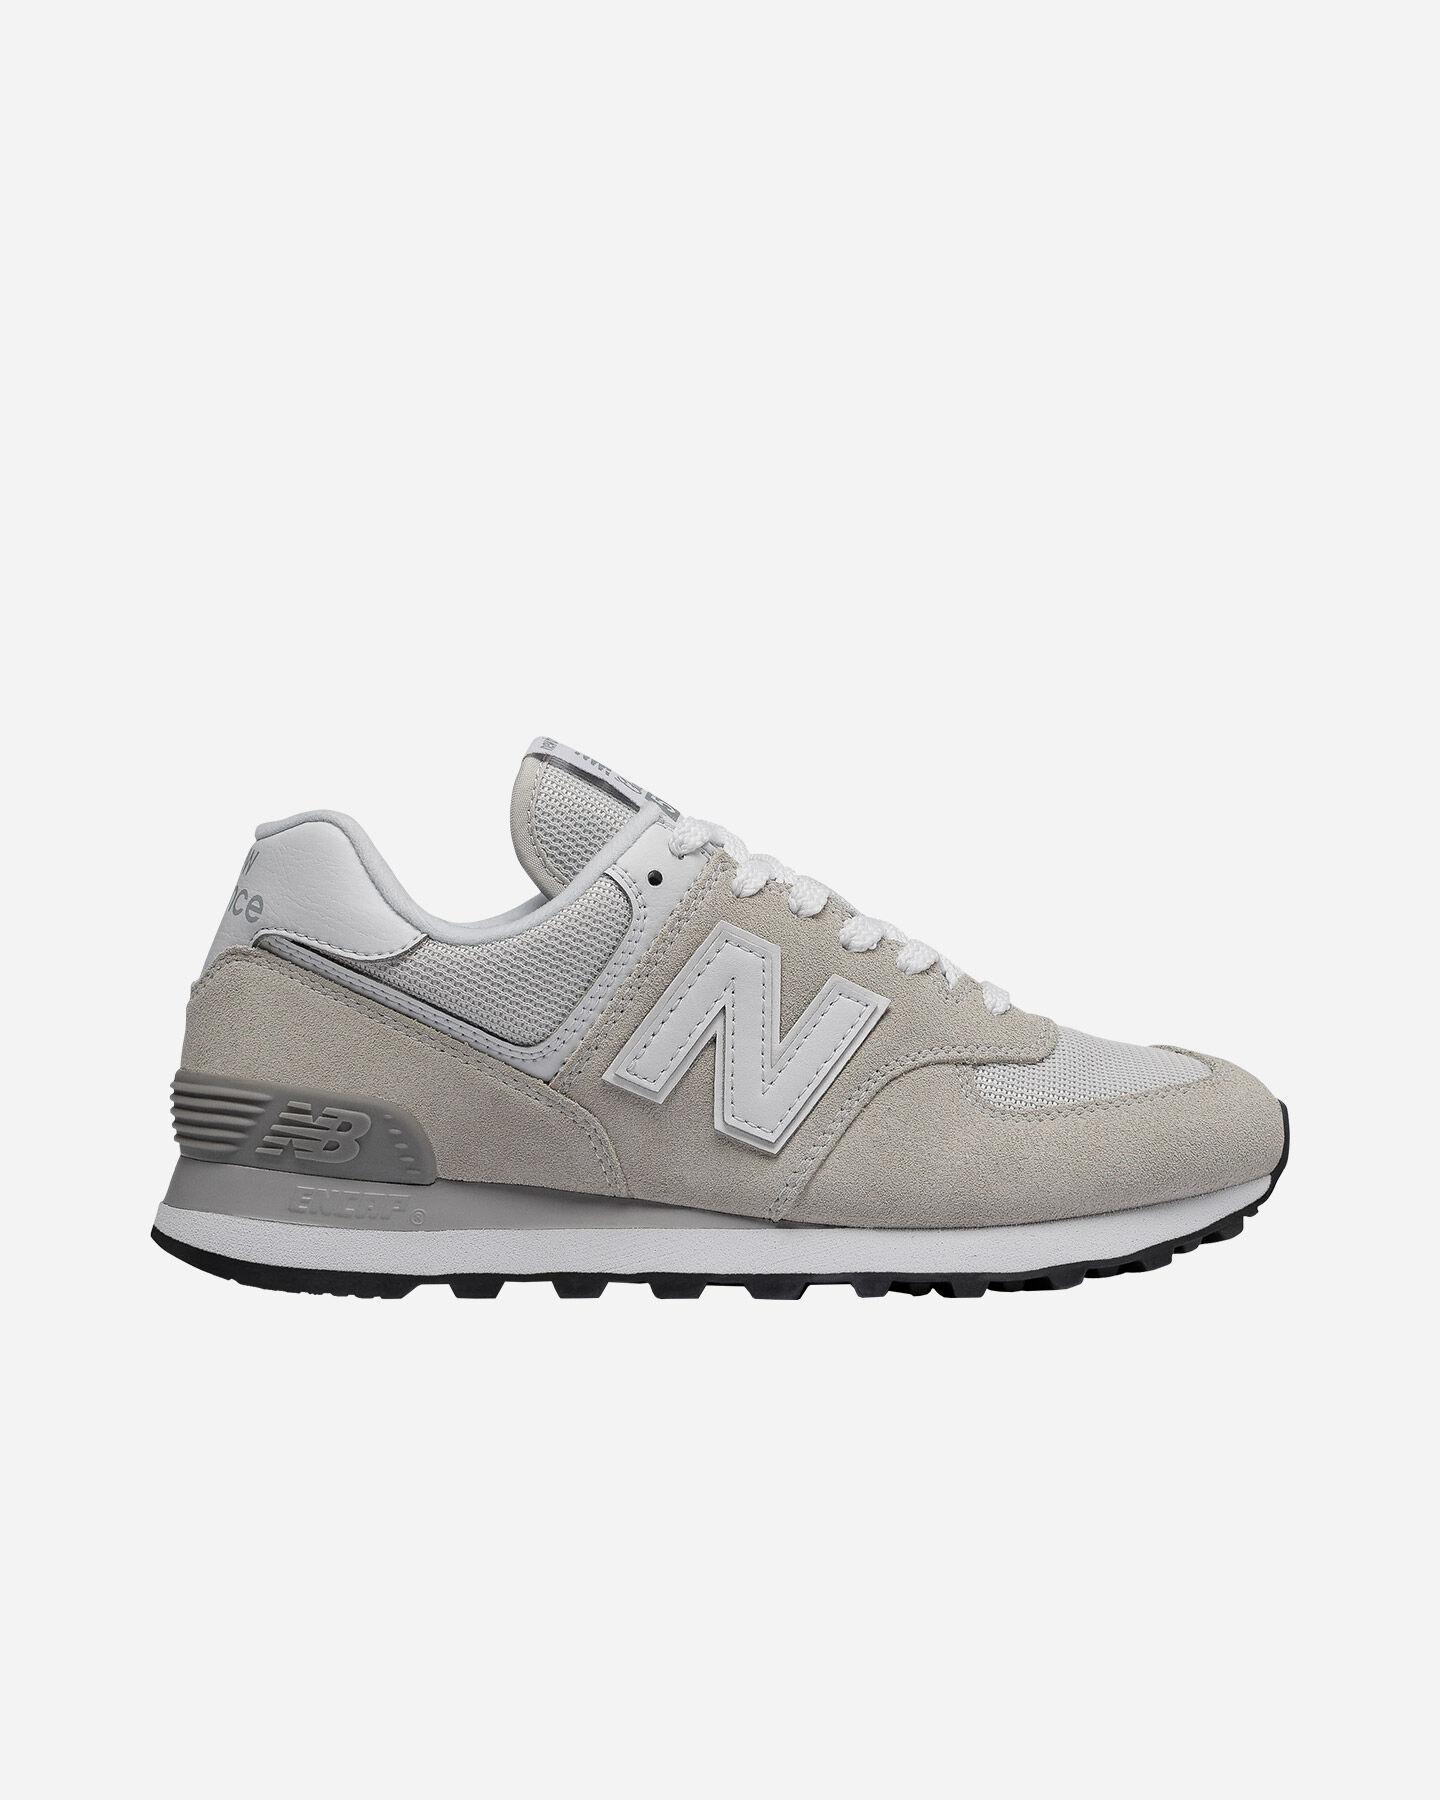 8c0811f734 scarpe donna sportive